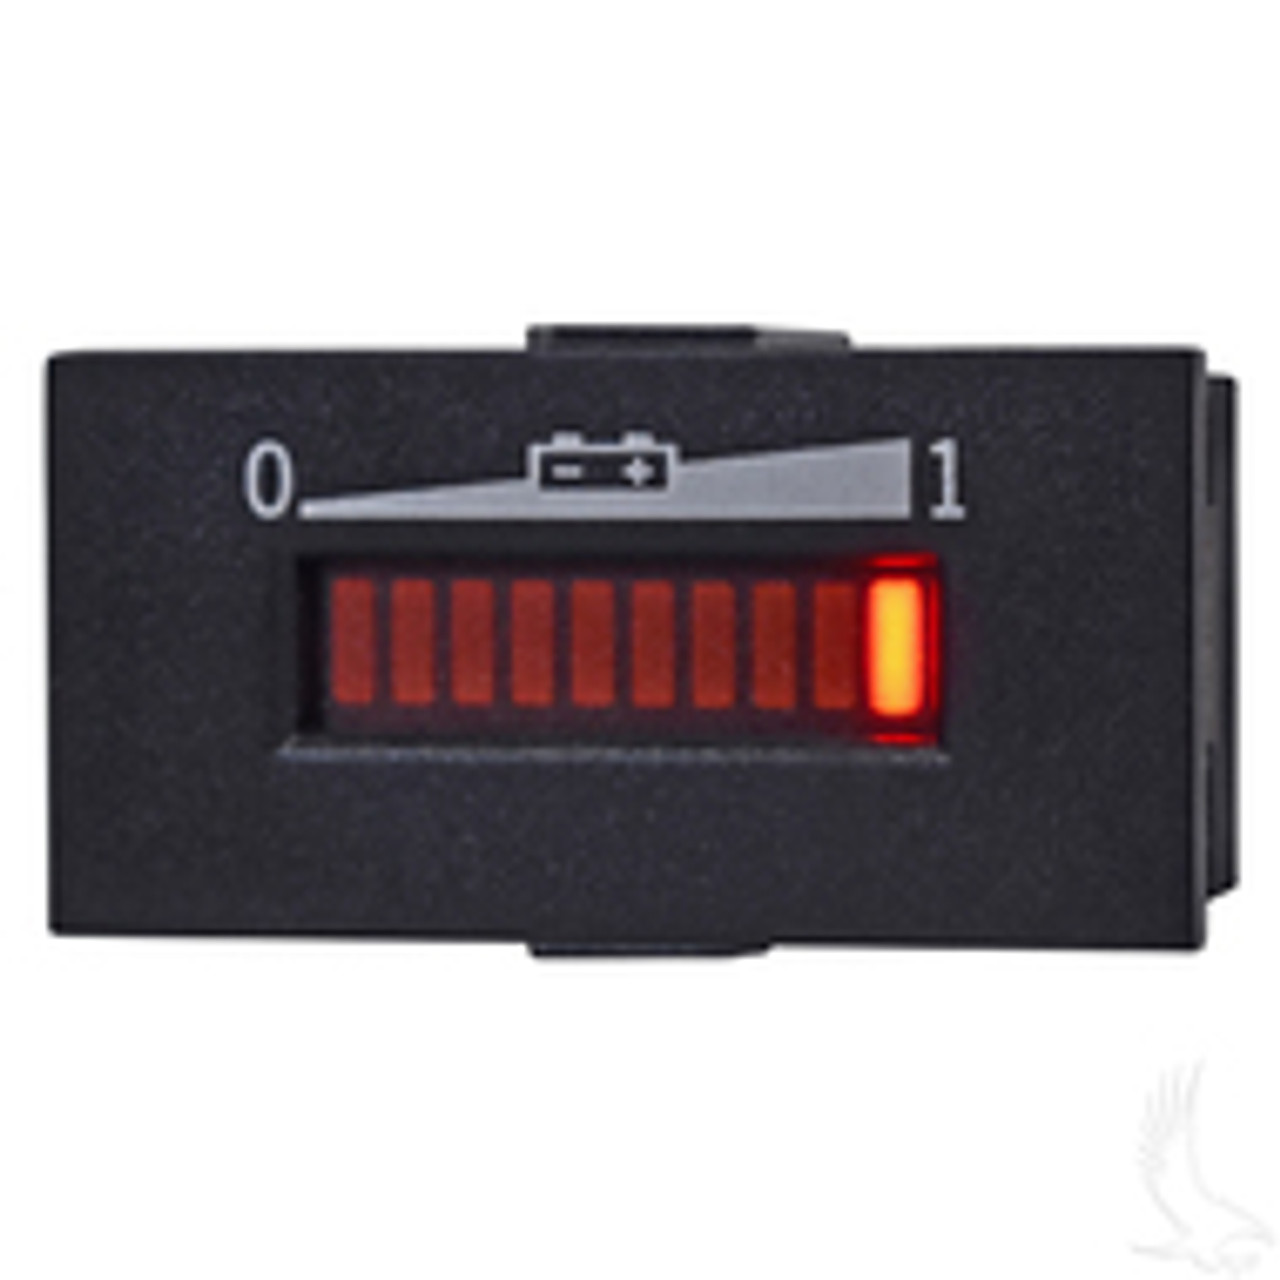 36 Volt Charge Meters